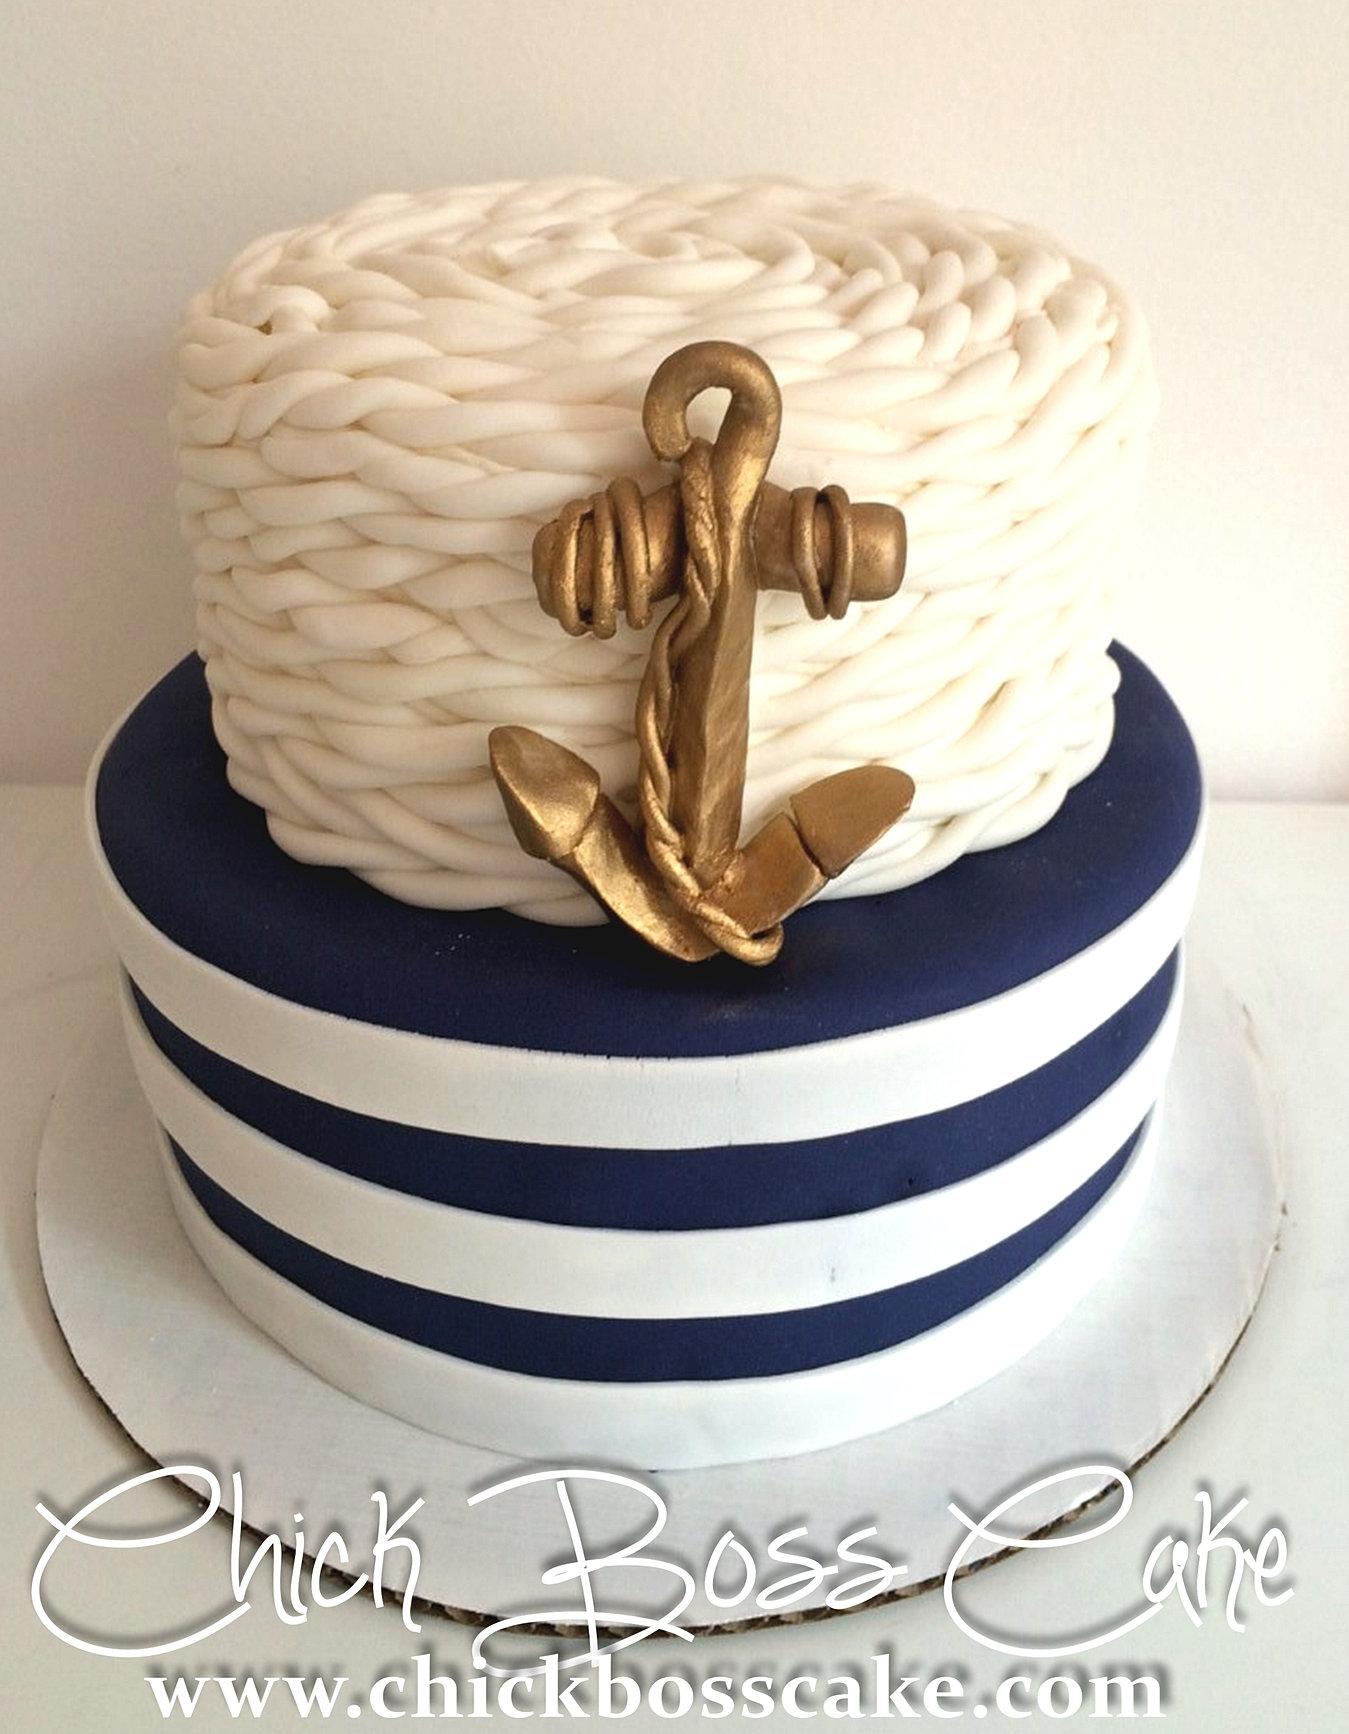 Chick Boss Cake Custom Cakes Custom CupcakesCake Delivery London